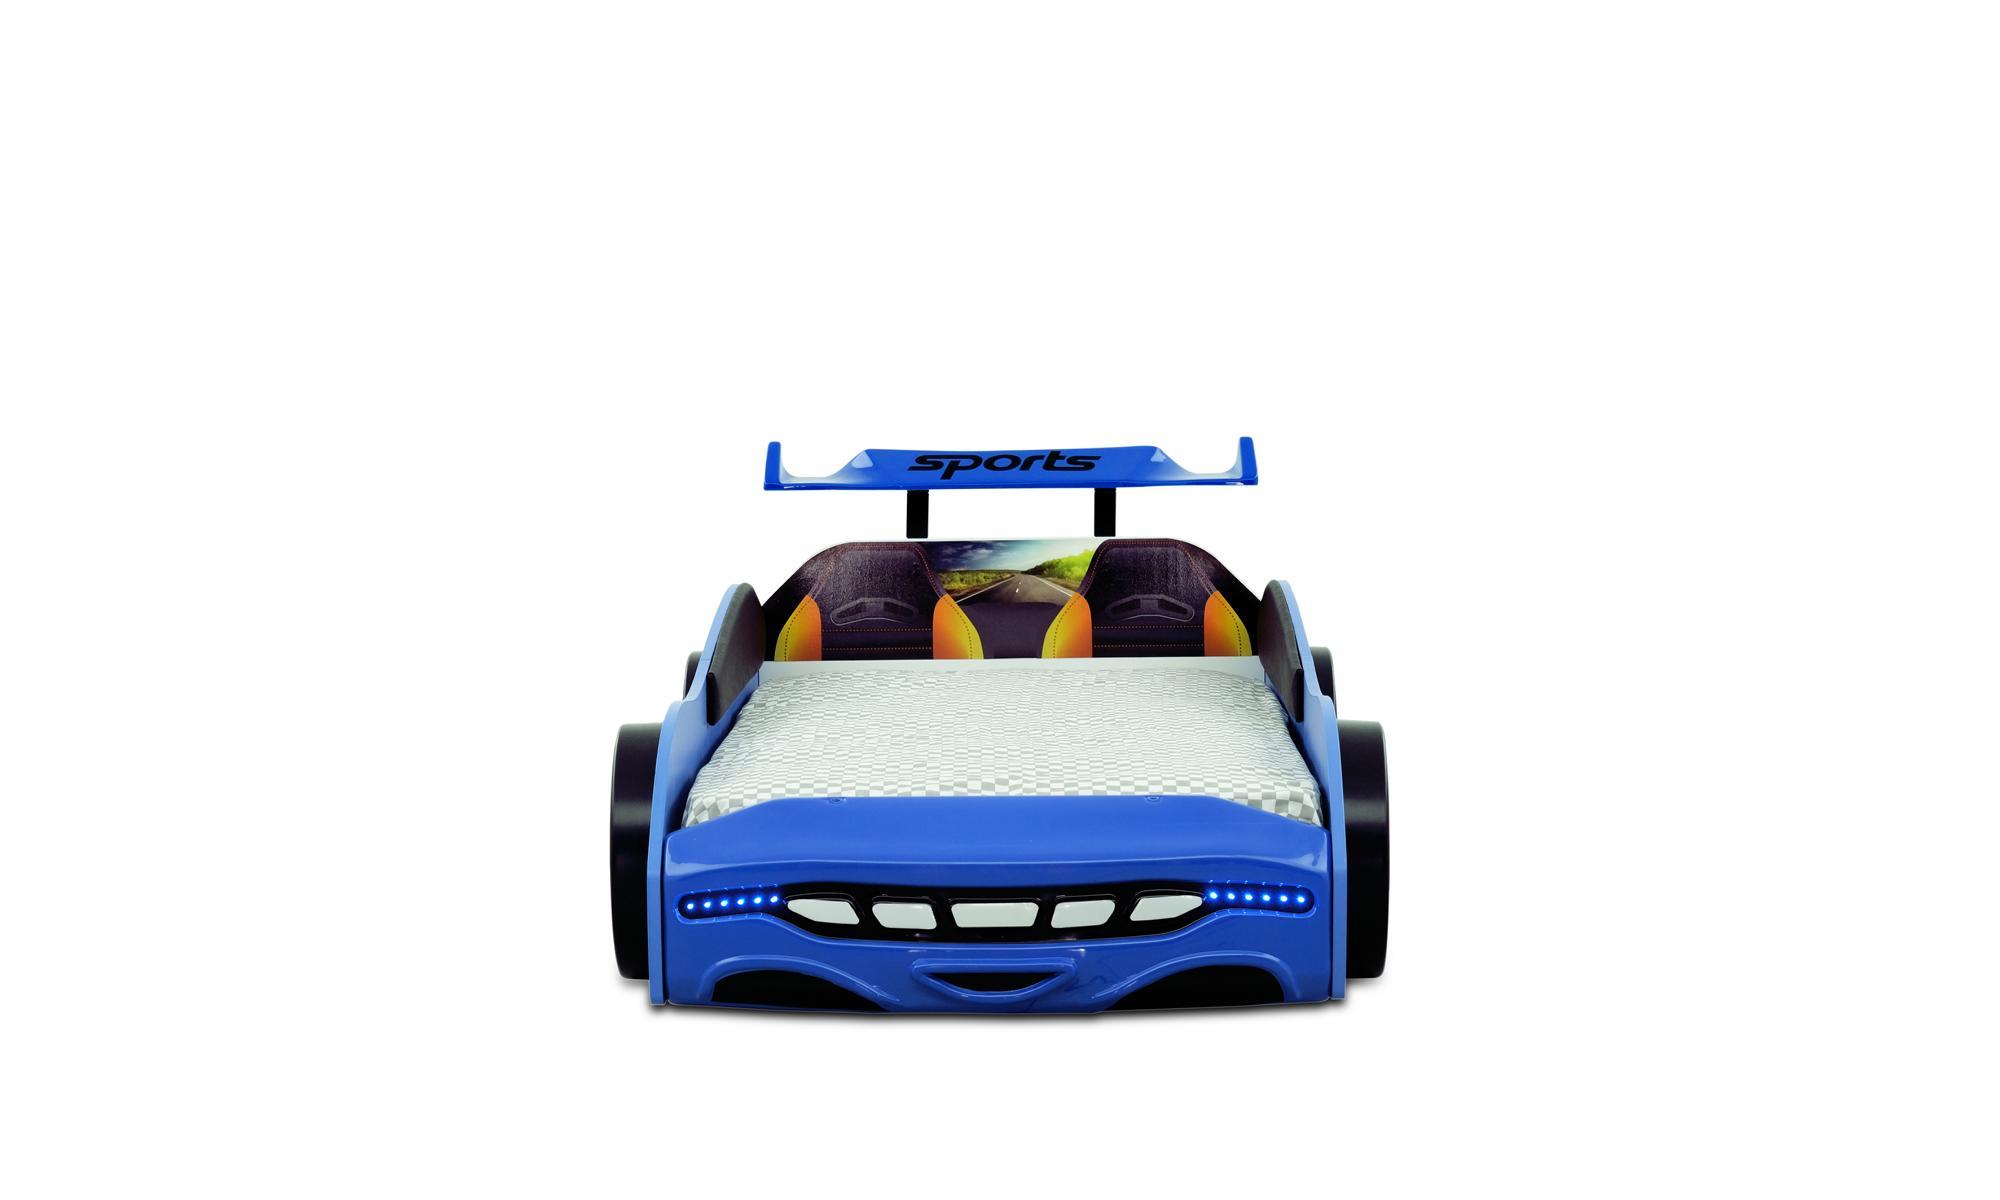 Autobett Kinderbett Sport 2.0 Blau mit Spoiler